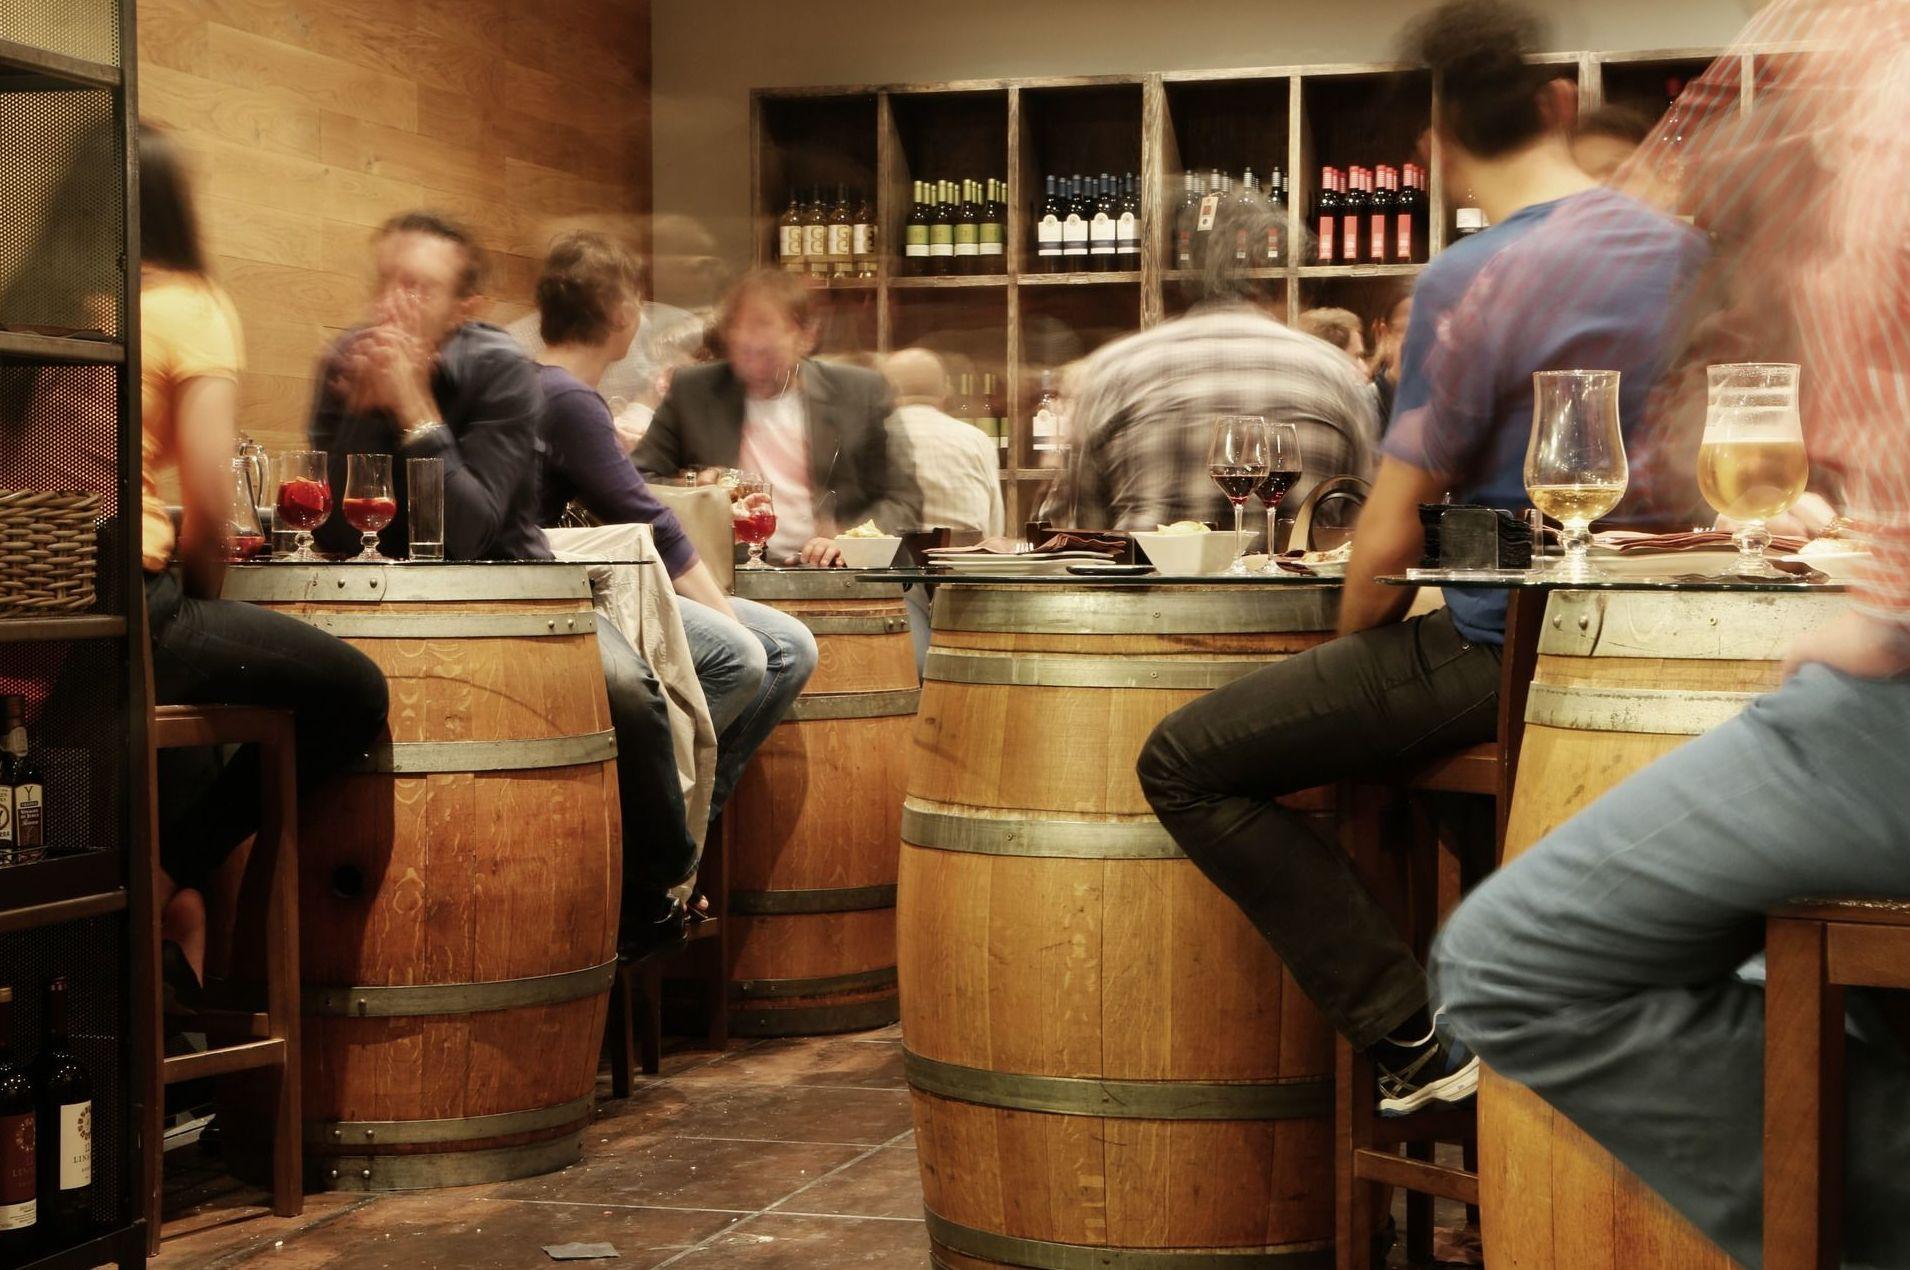 Un buen lugar para ir de tapas en Alcalá de Henares